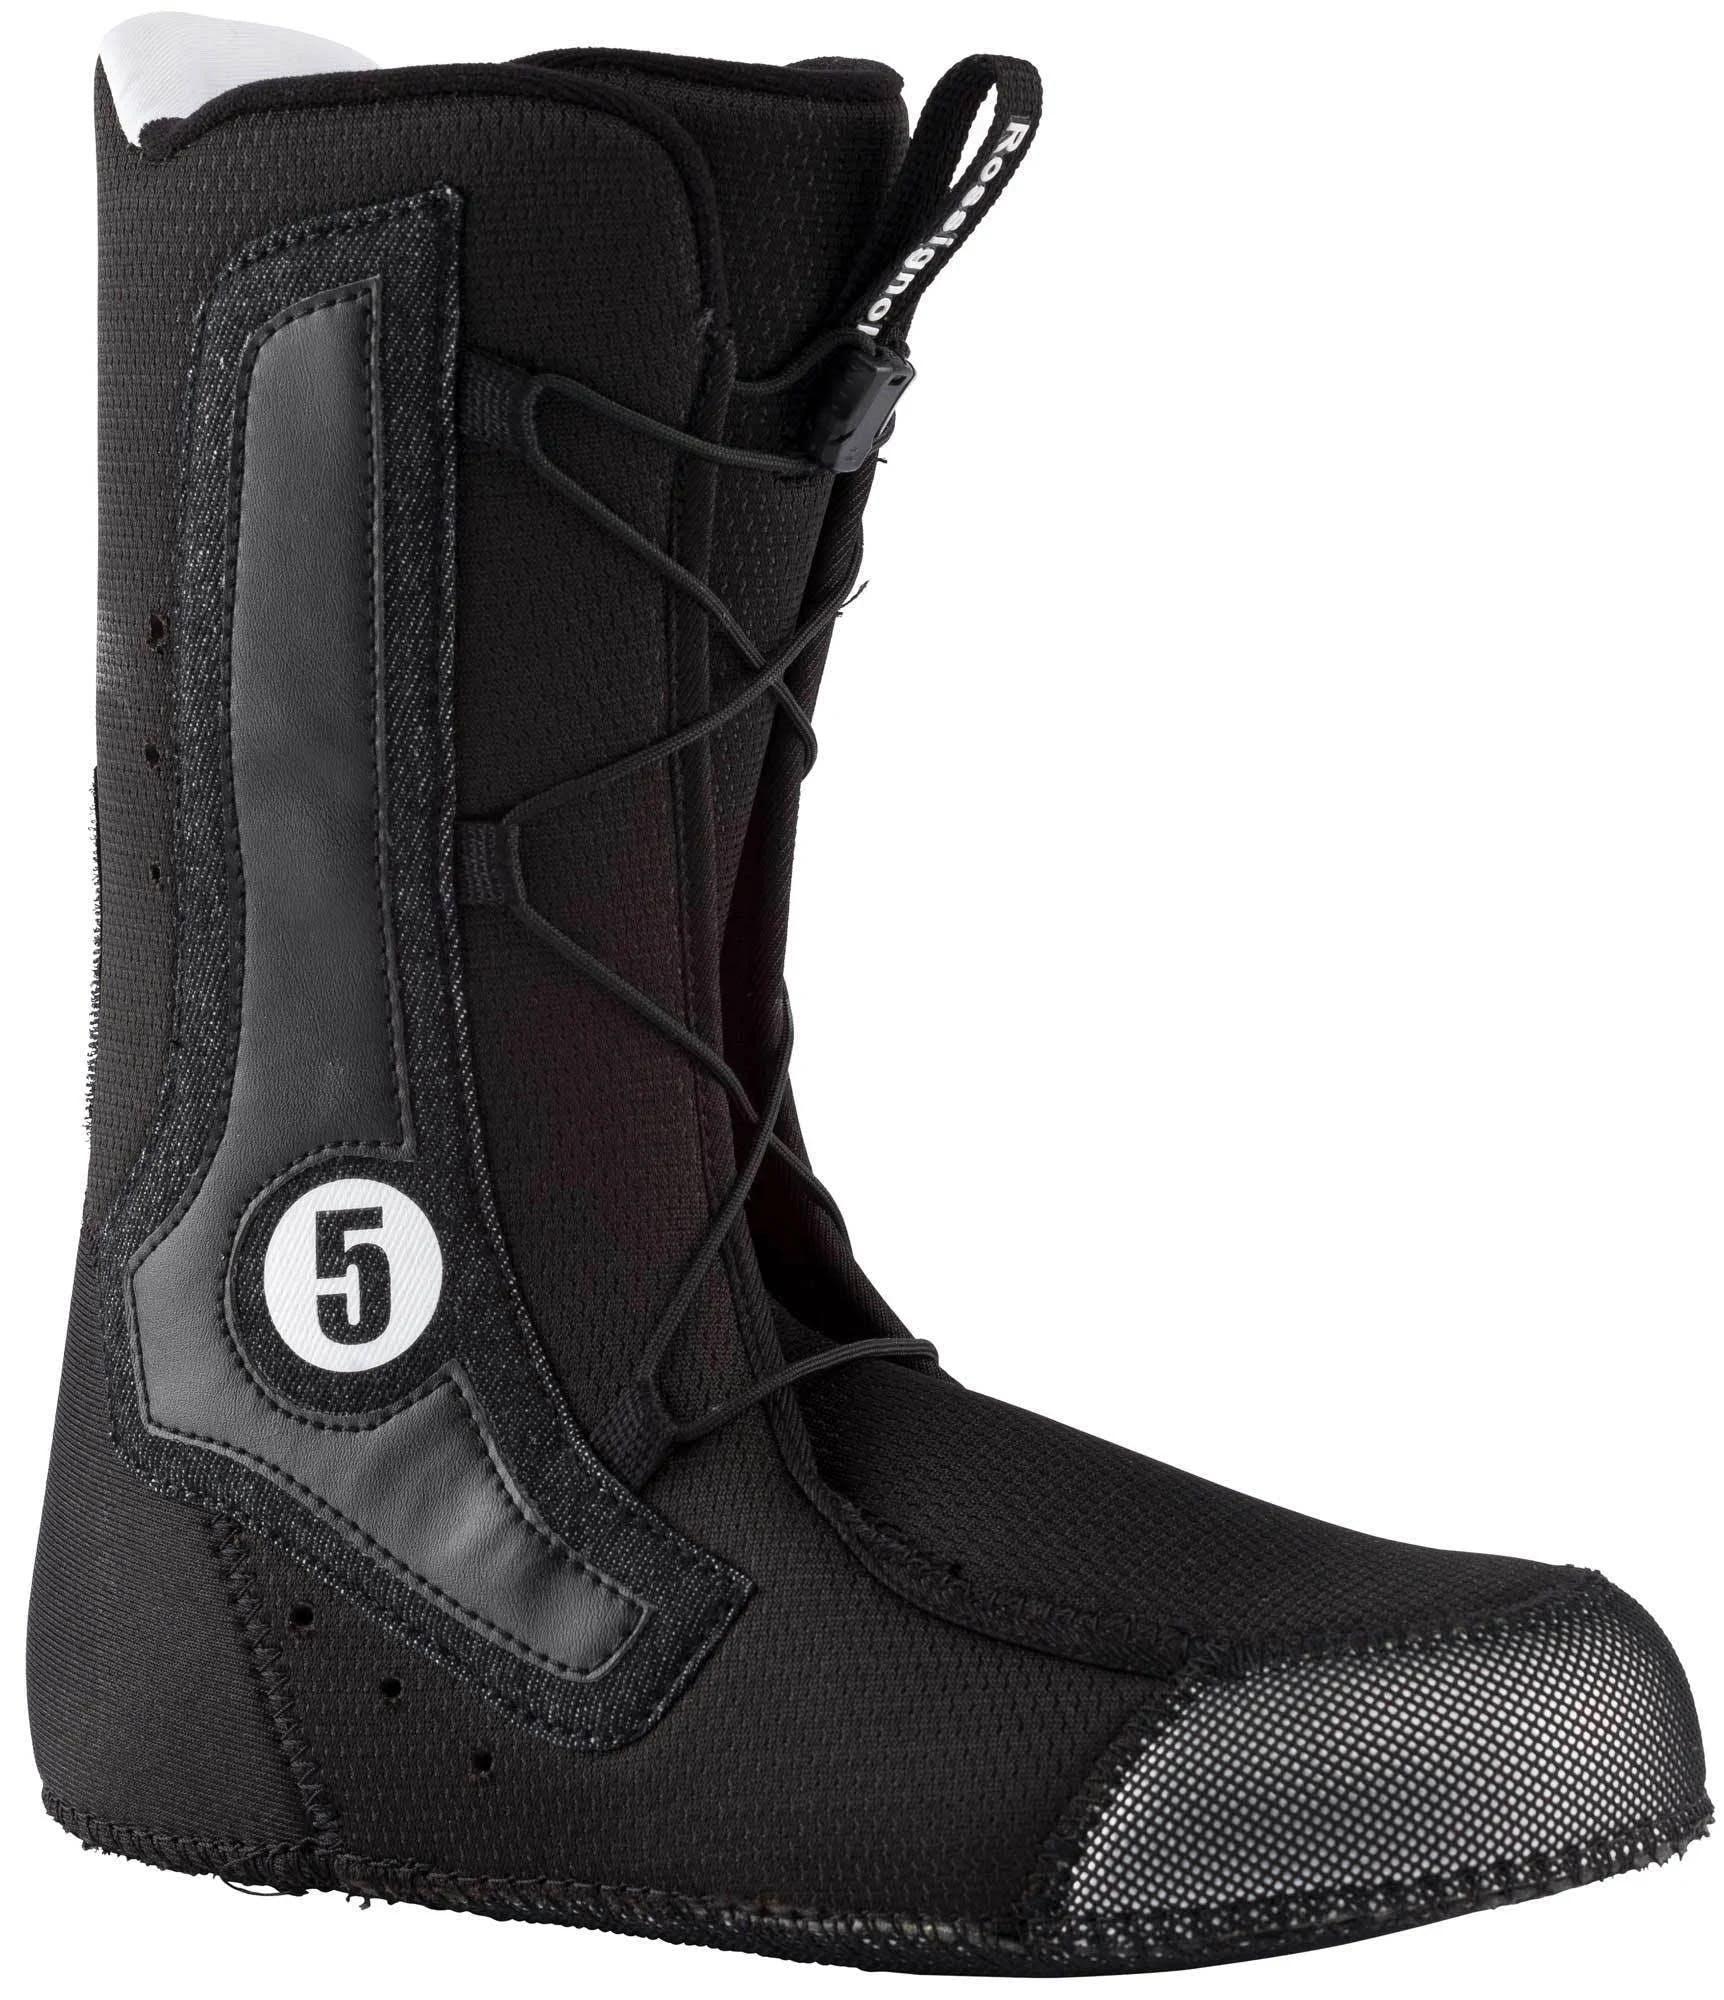 Rossignol Alley BOA H3 Snowboard Boots   8 / Black · 2021